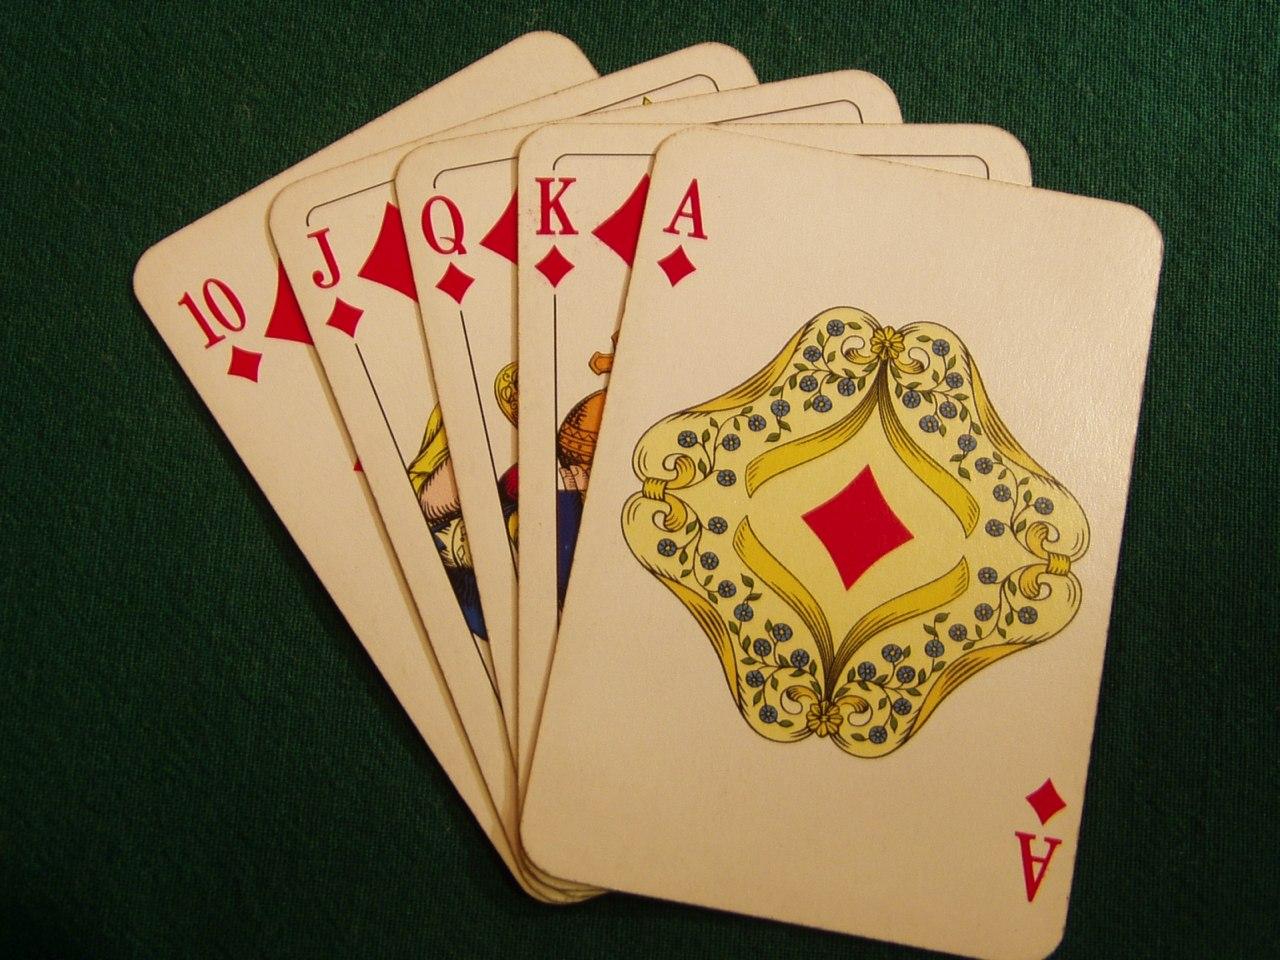 Wallpaper 3d Iphone 6 Plus Ⓦallⓟapers Sfondi Poker